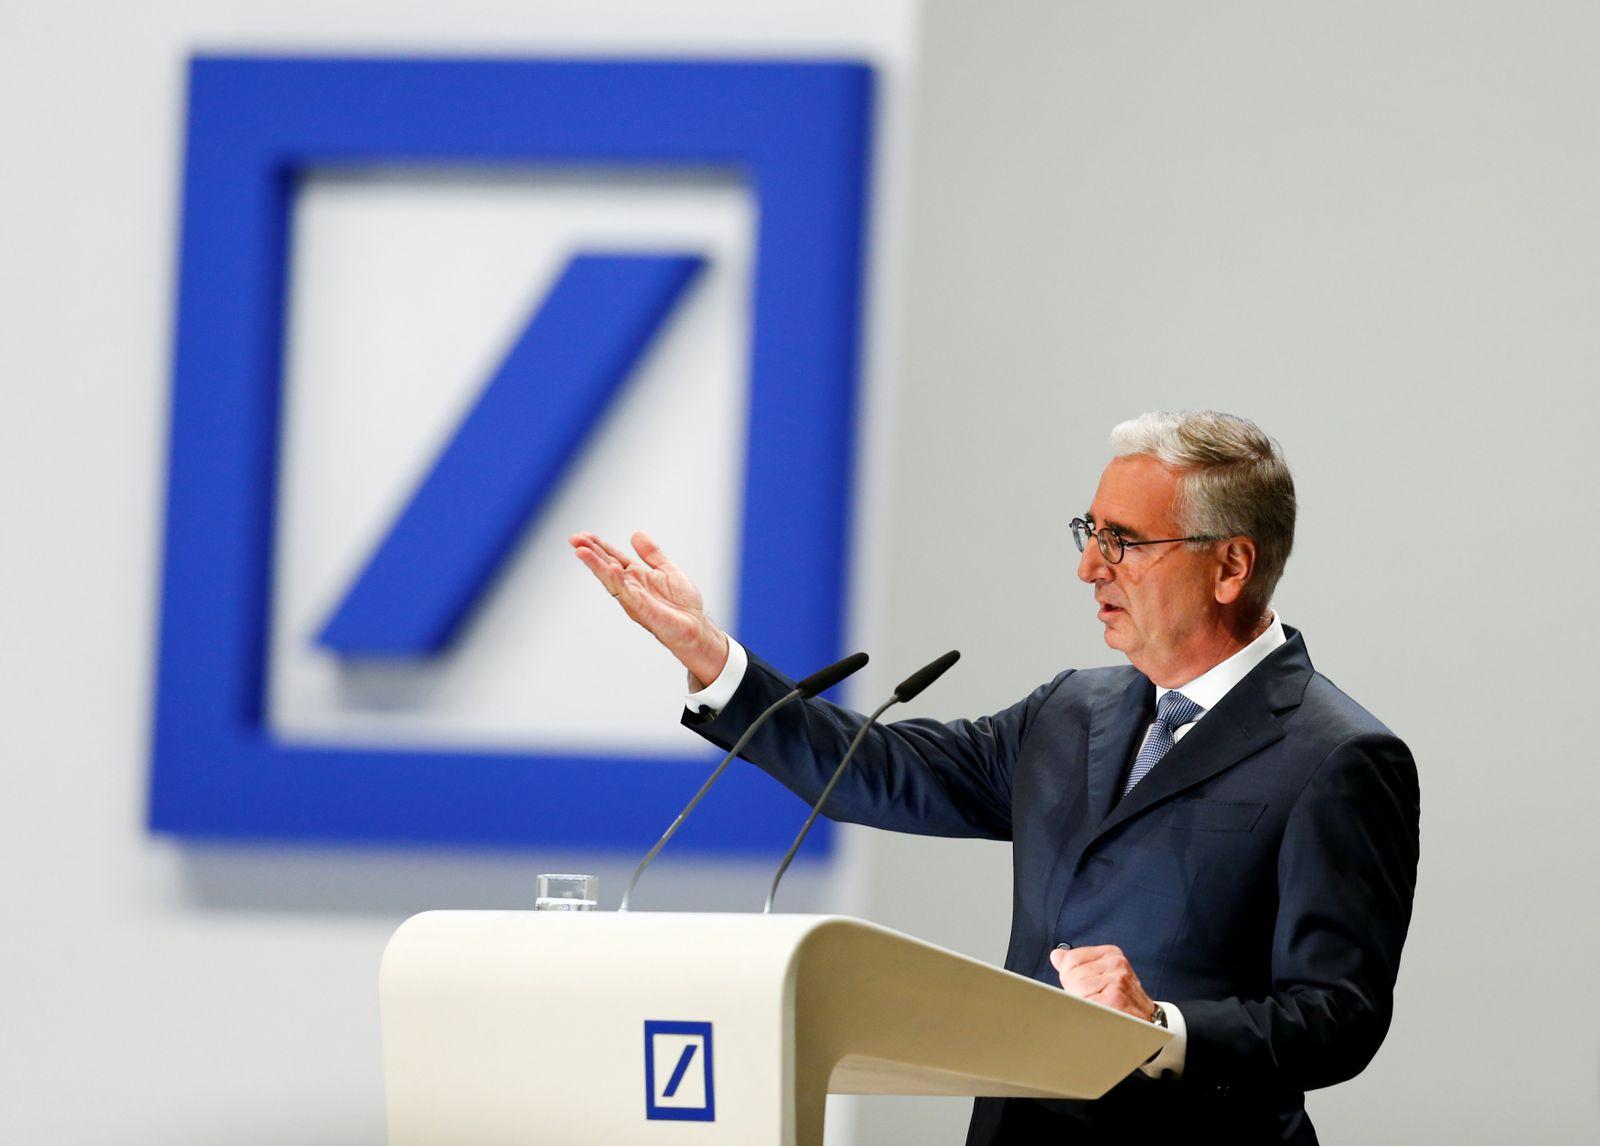 Deutsche Bank / Paul Achleitner